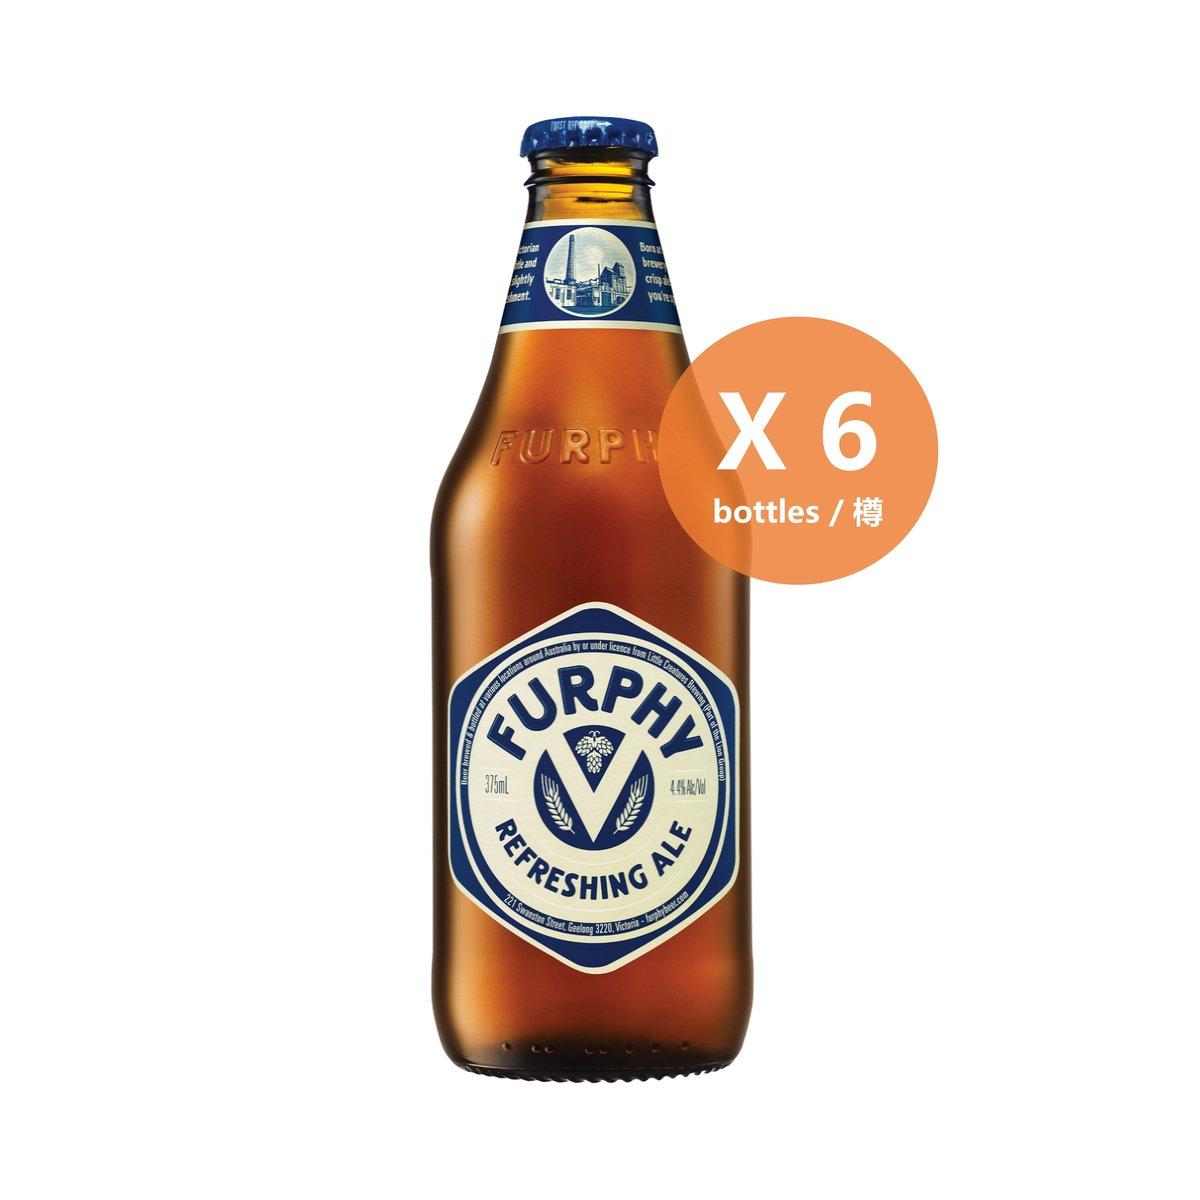 Refreshing Ale - 375ml x 6 Bottles